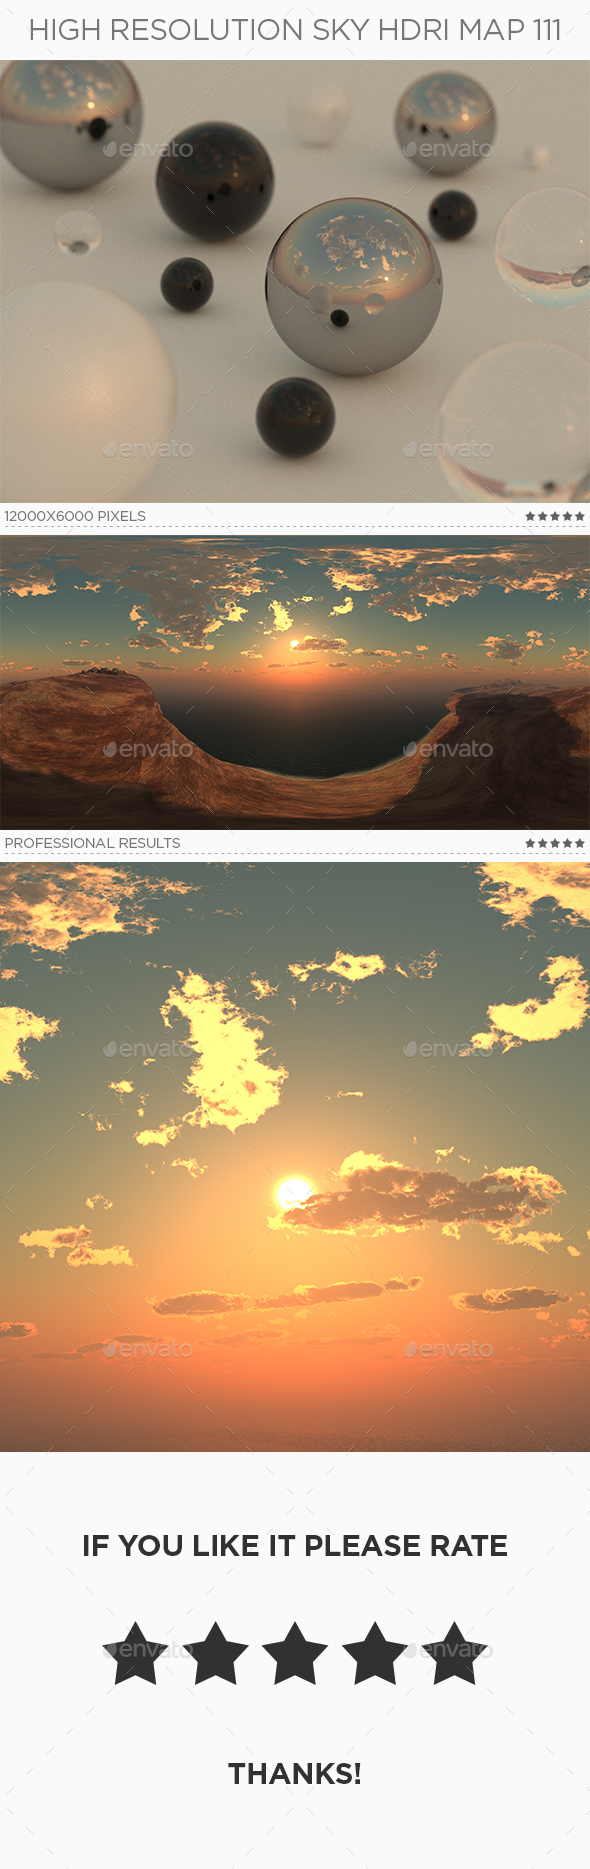 3DOcean High Resolution Sky HDRi Map 111 20398875